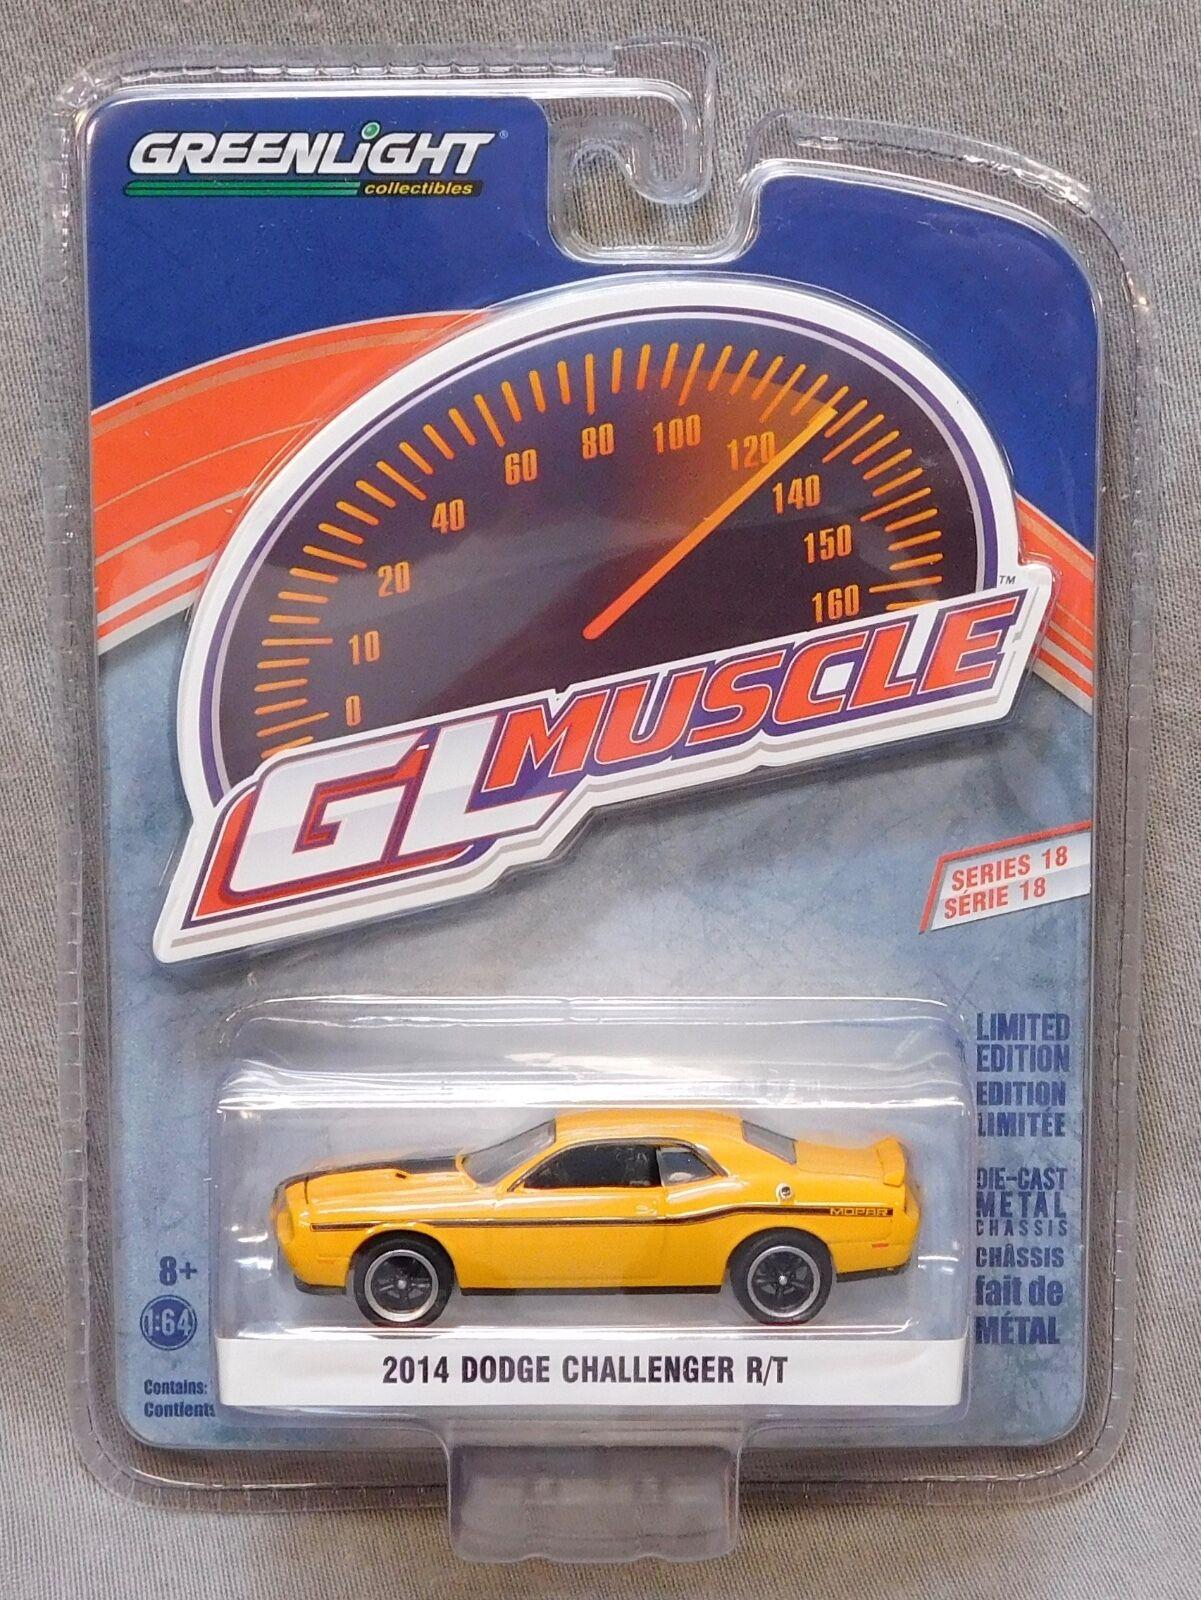 GREENLIGHT GL MUSCLE SERIES 18 SIX CARS 1:64 DIECAST CAR GREENLIGHT 13180